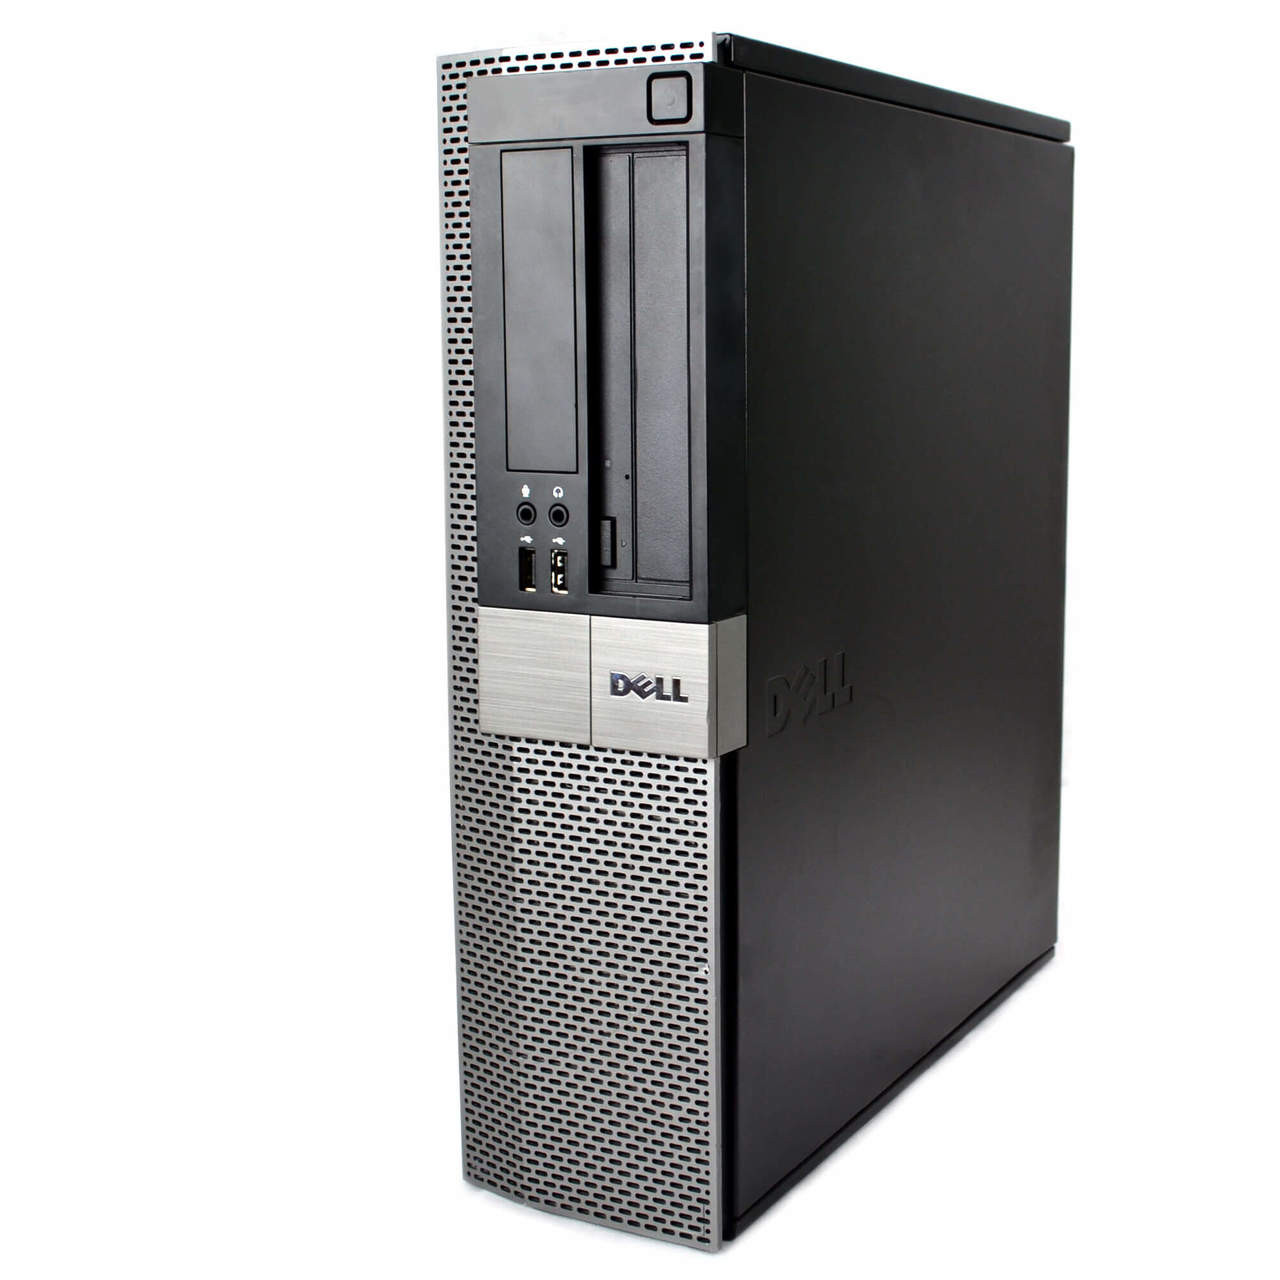 Dell Optiplex 980 Desktop - Front View